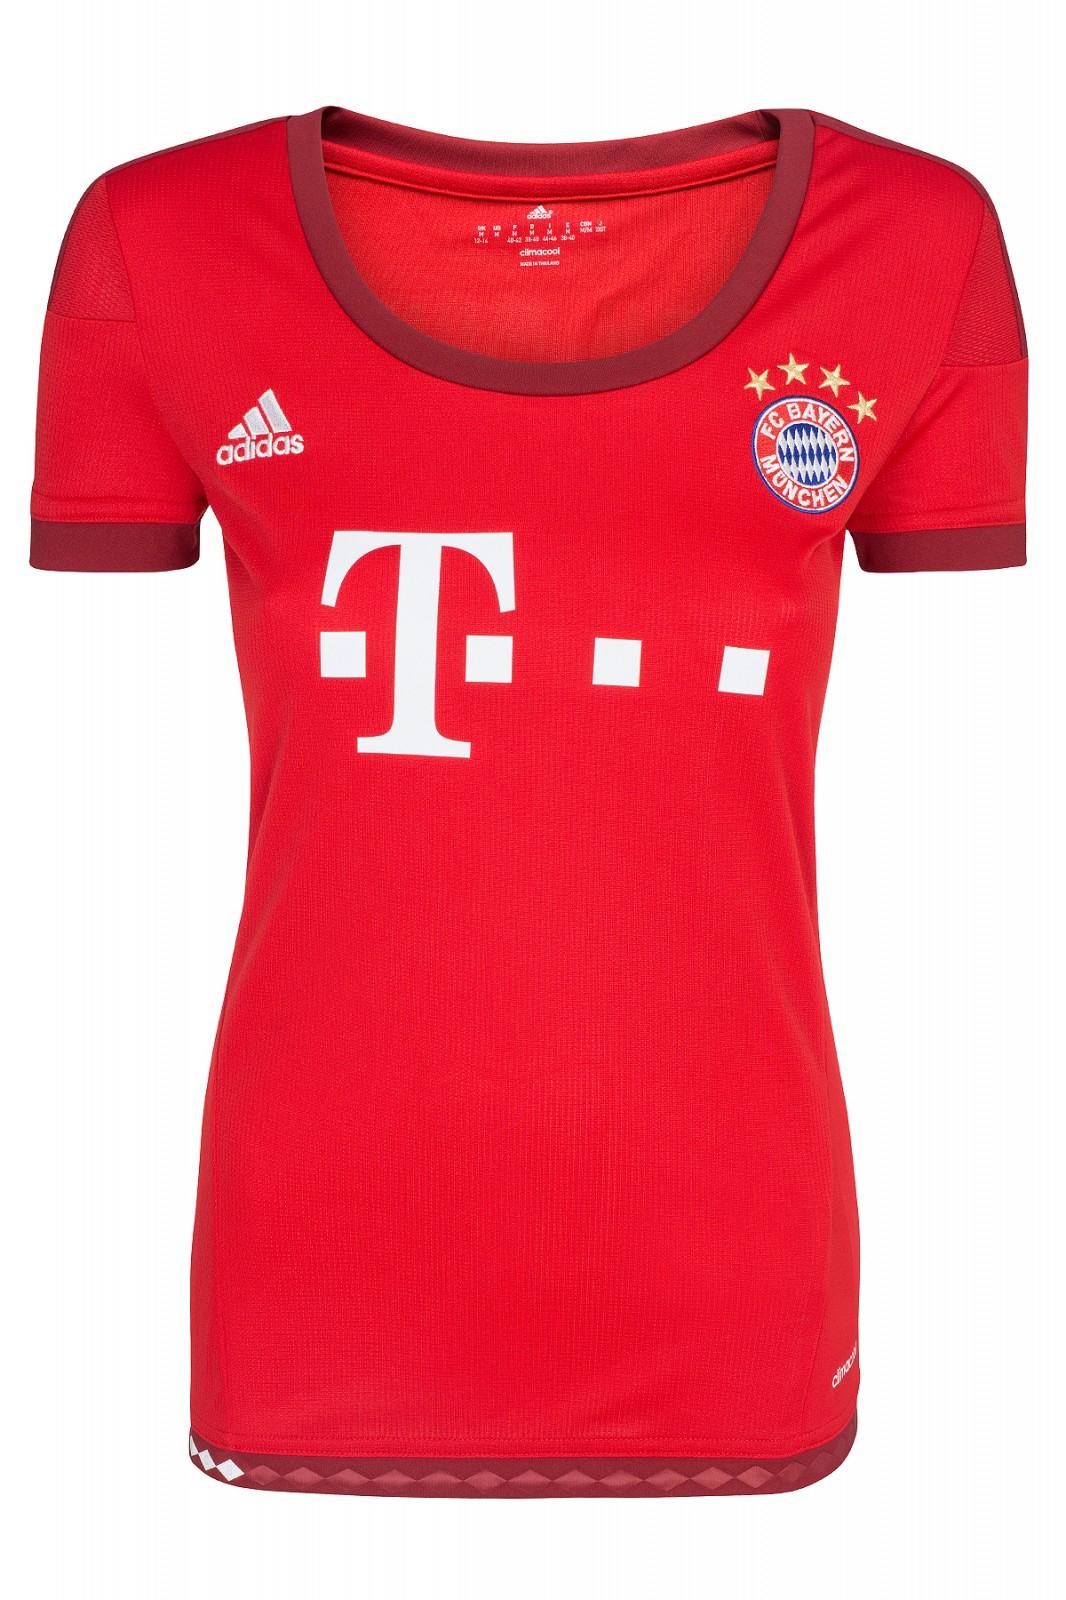 adidas Performance FC Bayern München 2016 Heim Jersey W Damen Fußball-Trikot Rot S08654